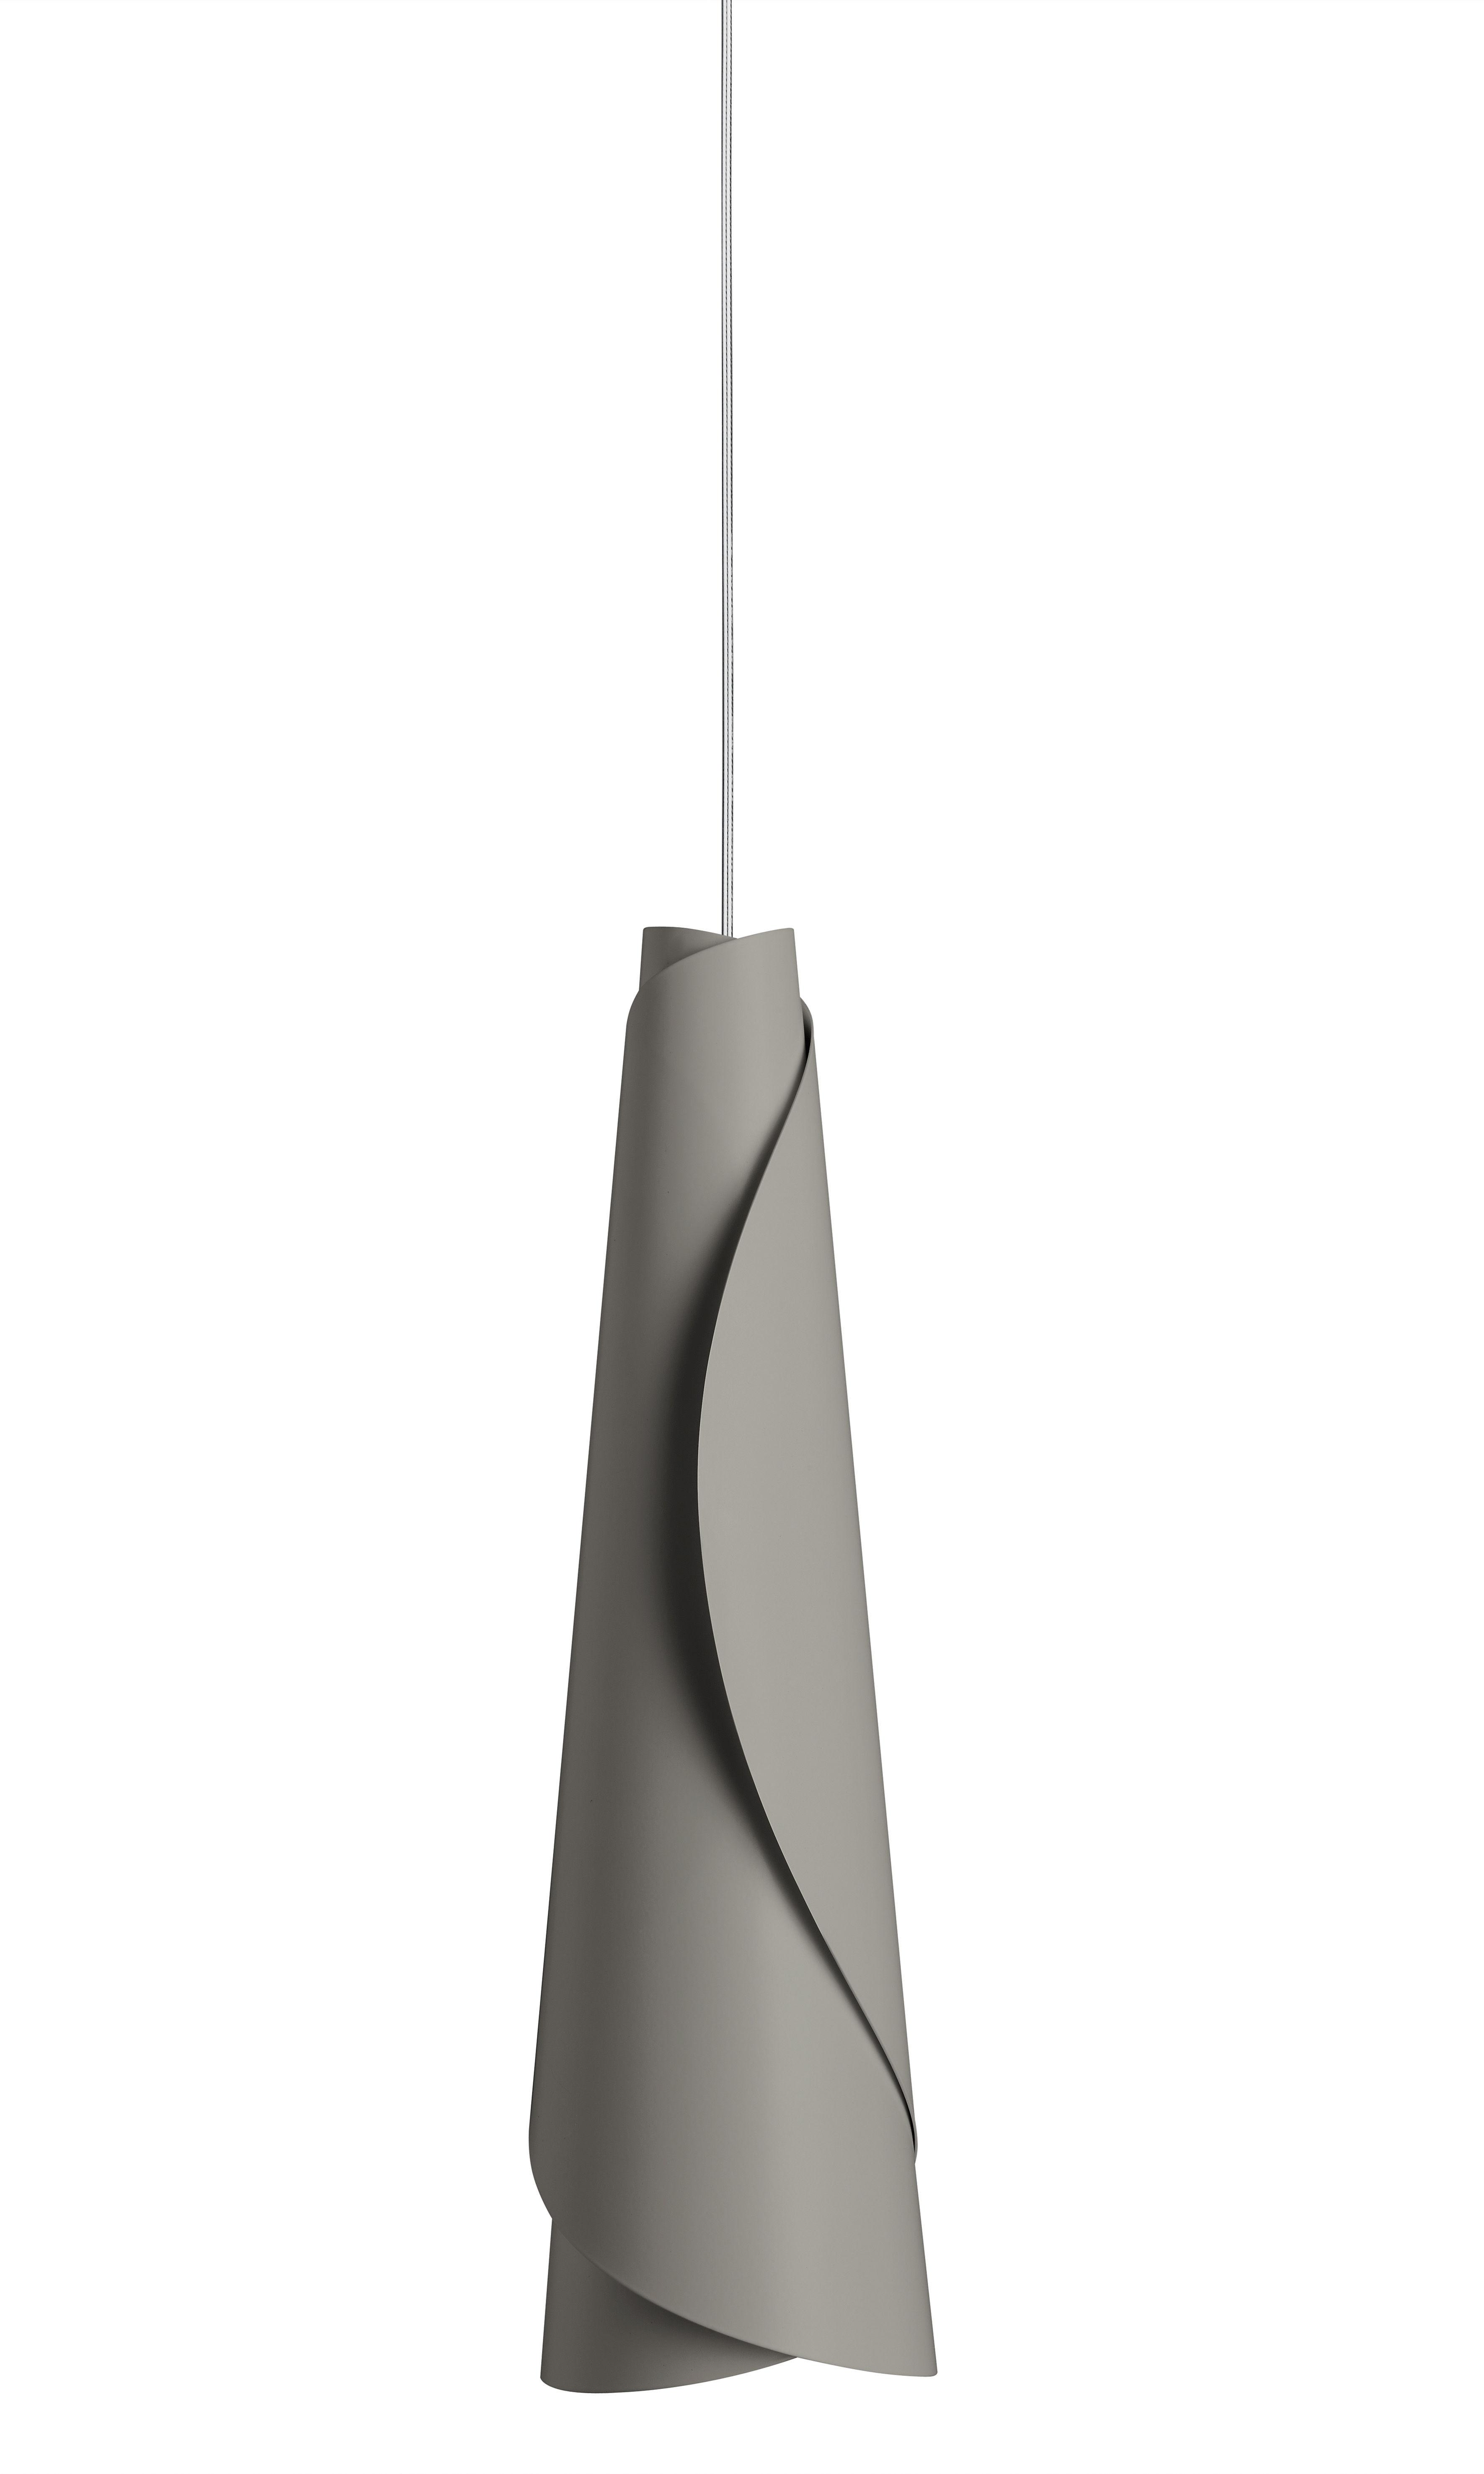 Leuchten - Pendelleuchten - Maki Pendelleuchte - Foscarini - Grau - lackiertes Aluminium